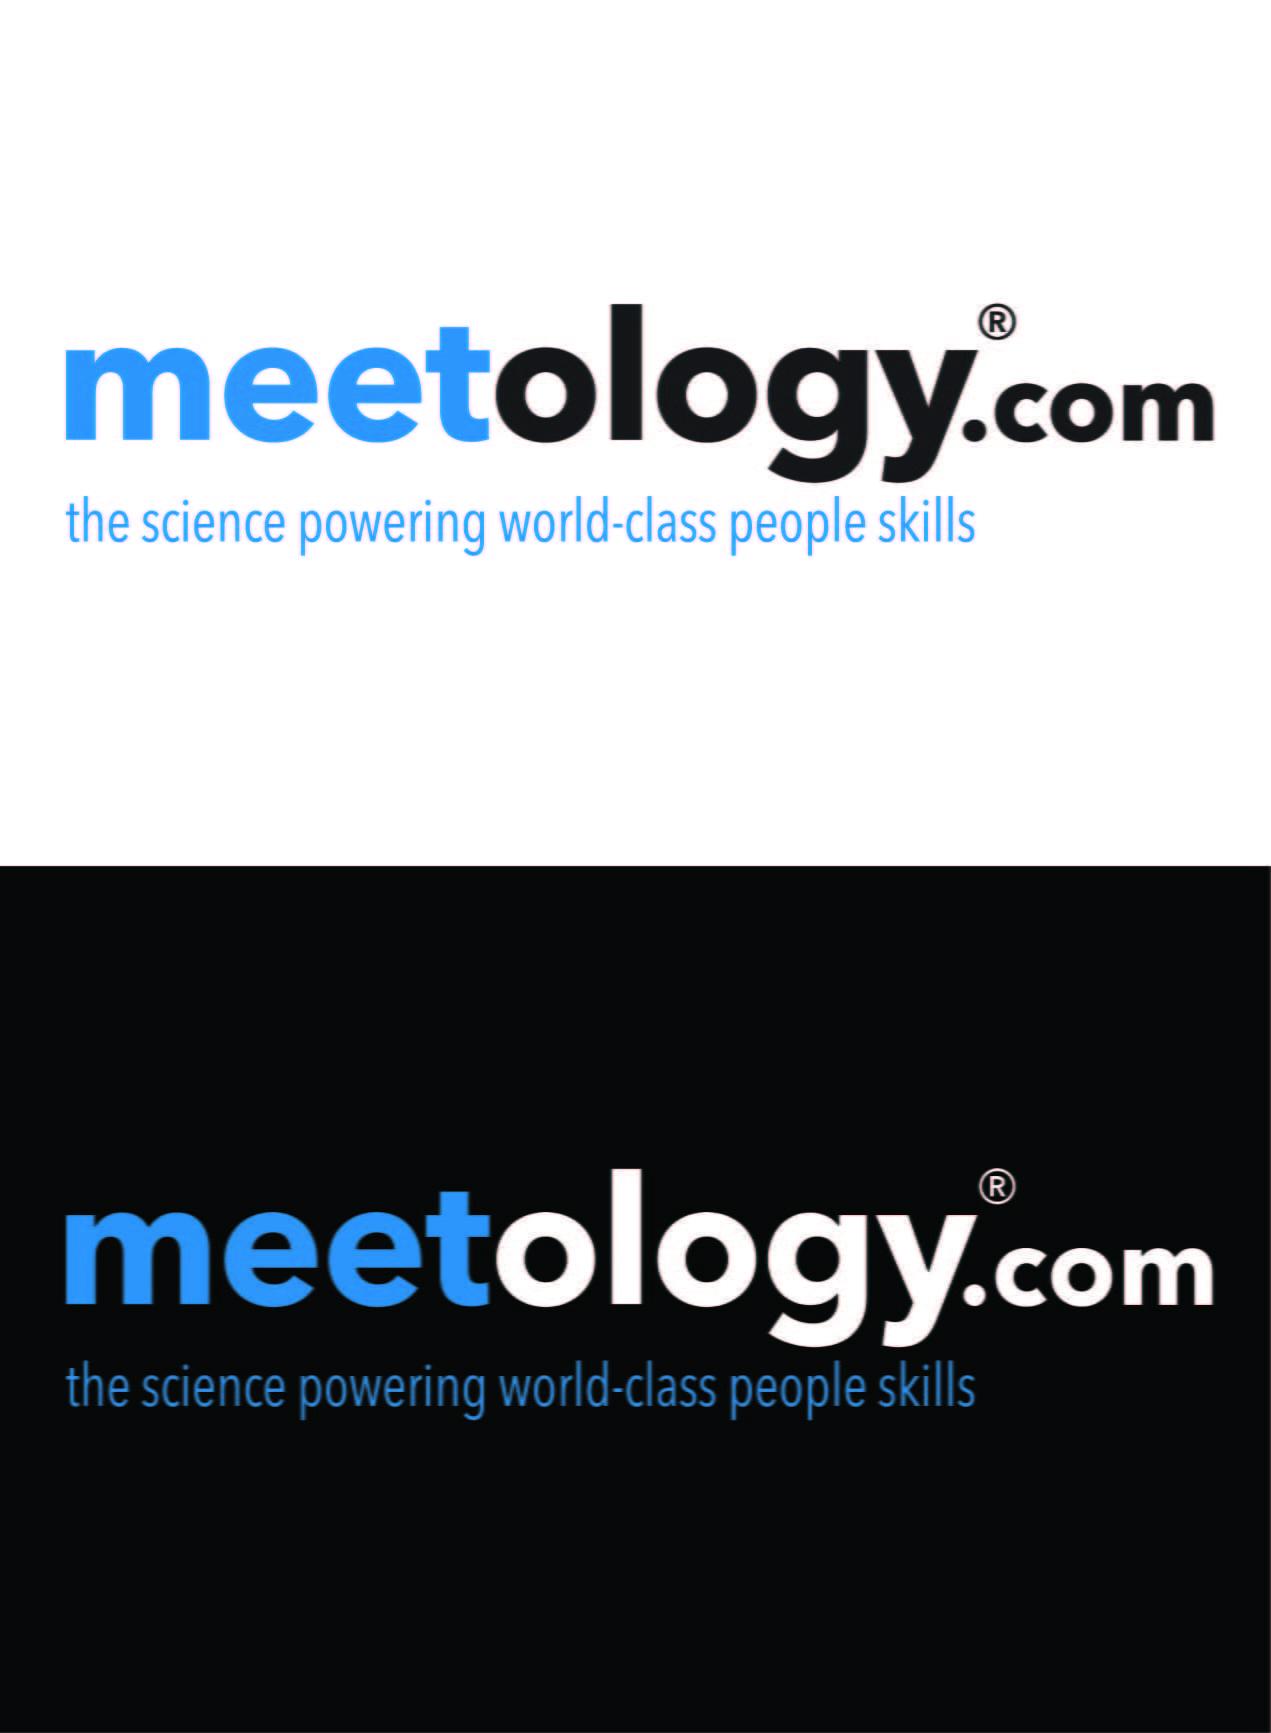 Meetology logo 1.3 Strapline & URL